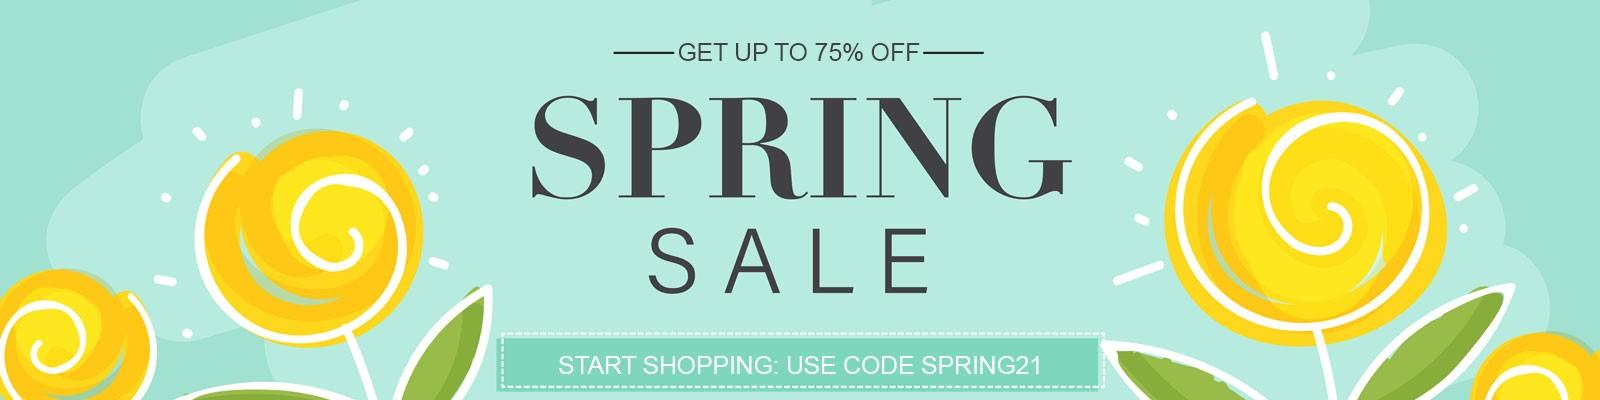 spring-sale-large.jpg